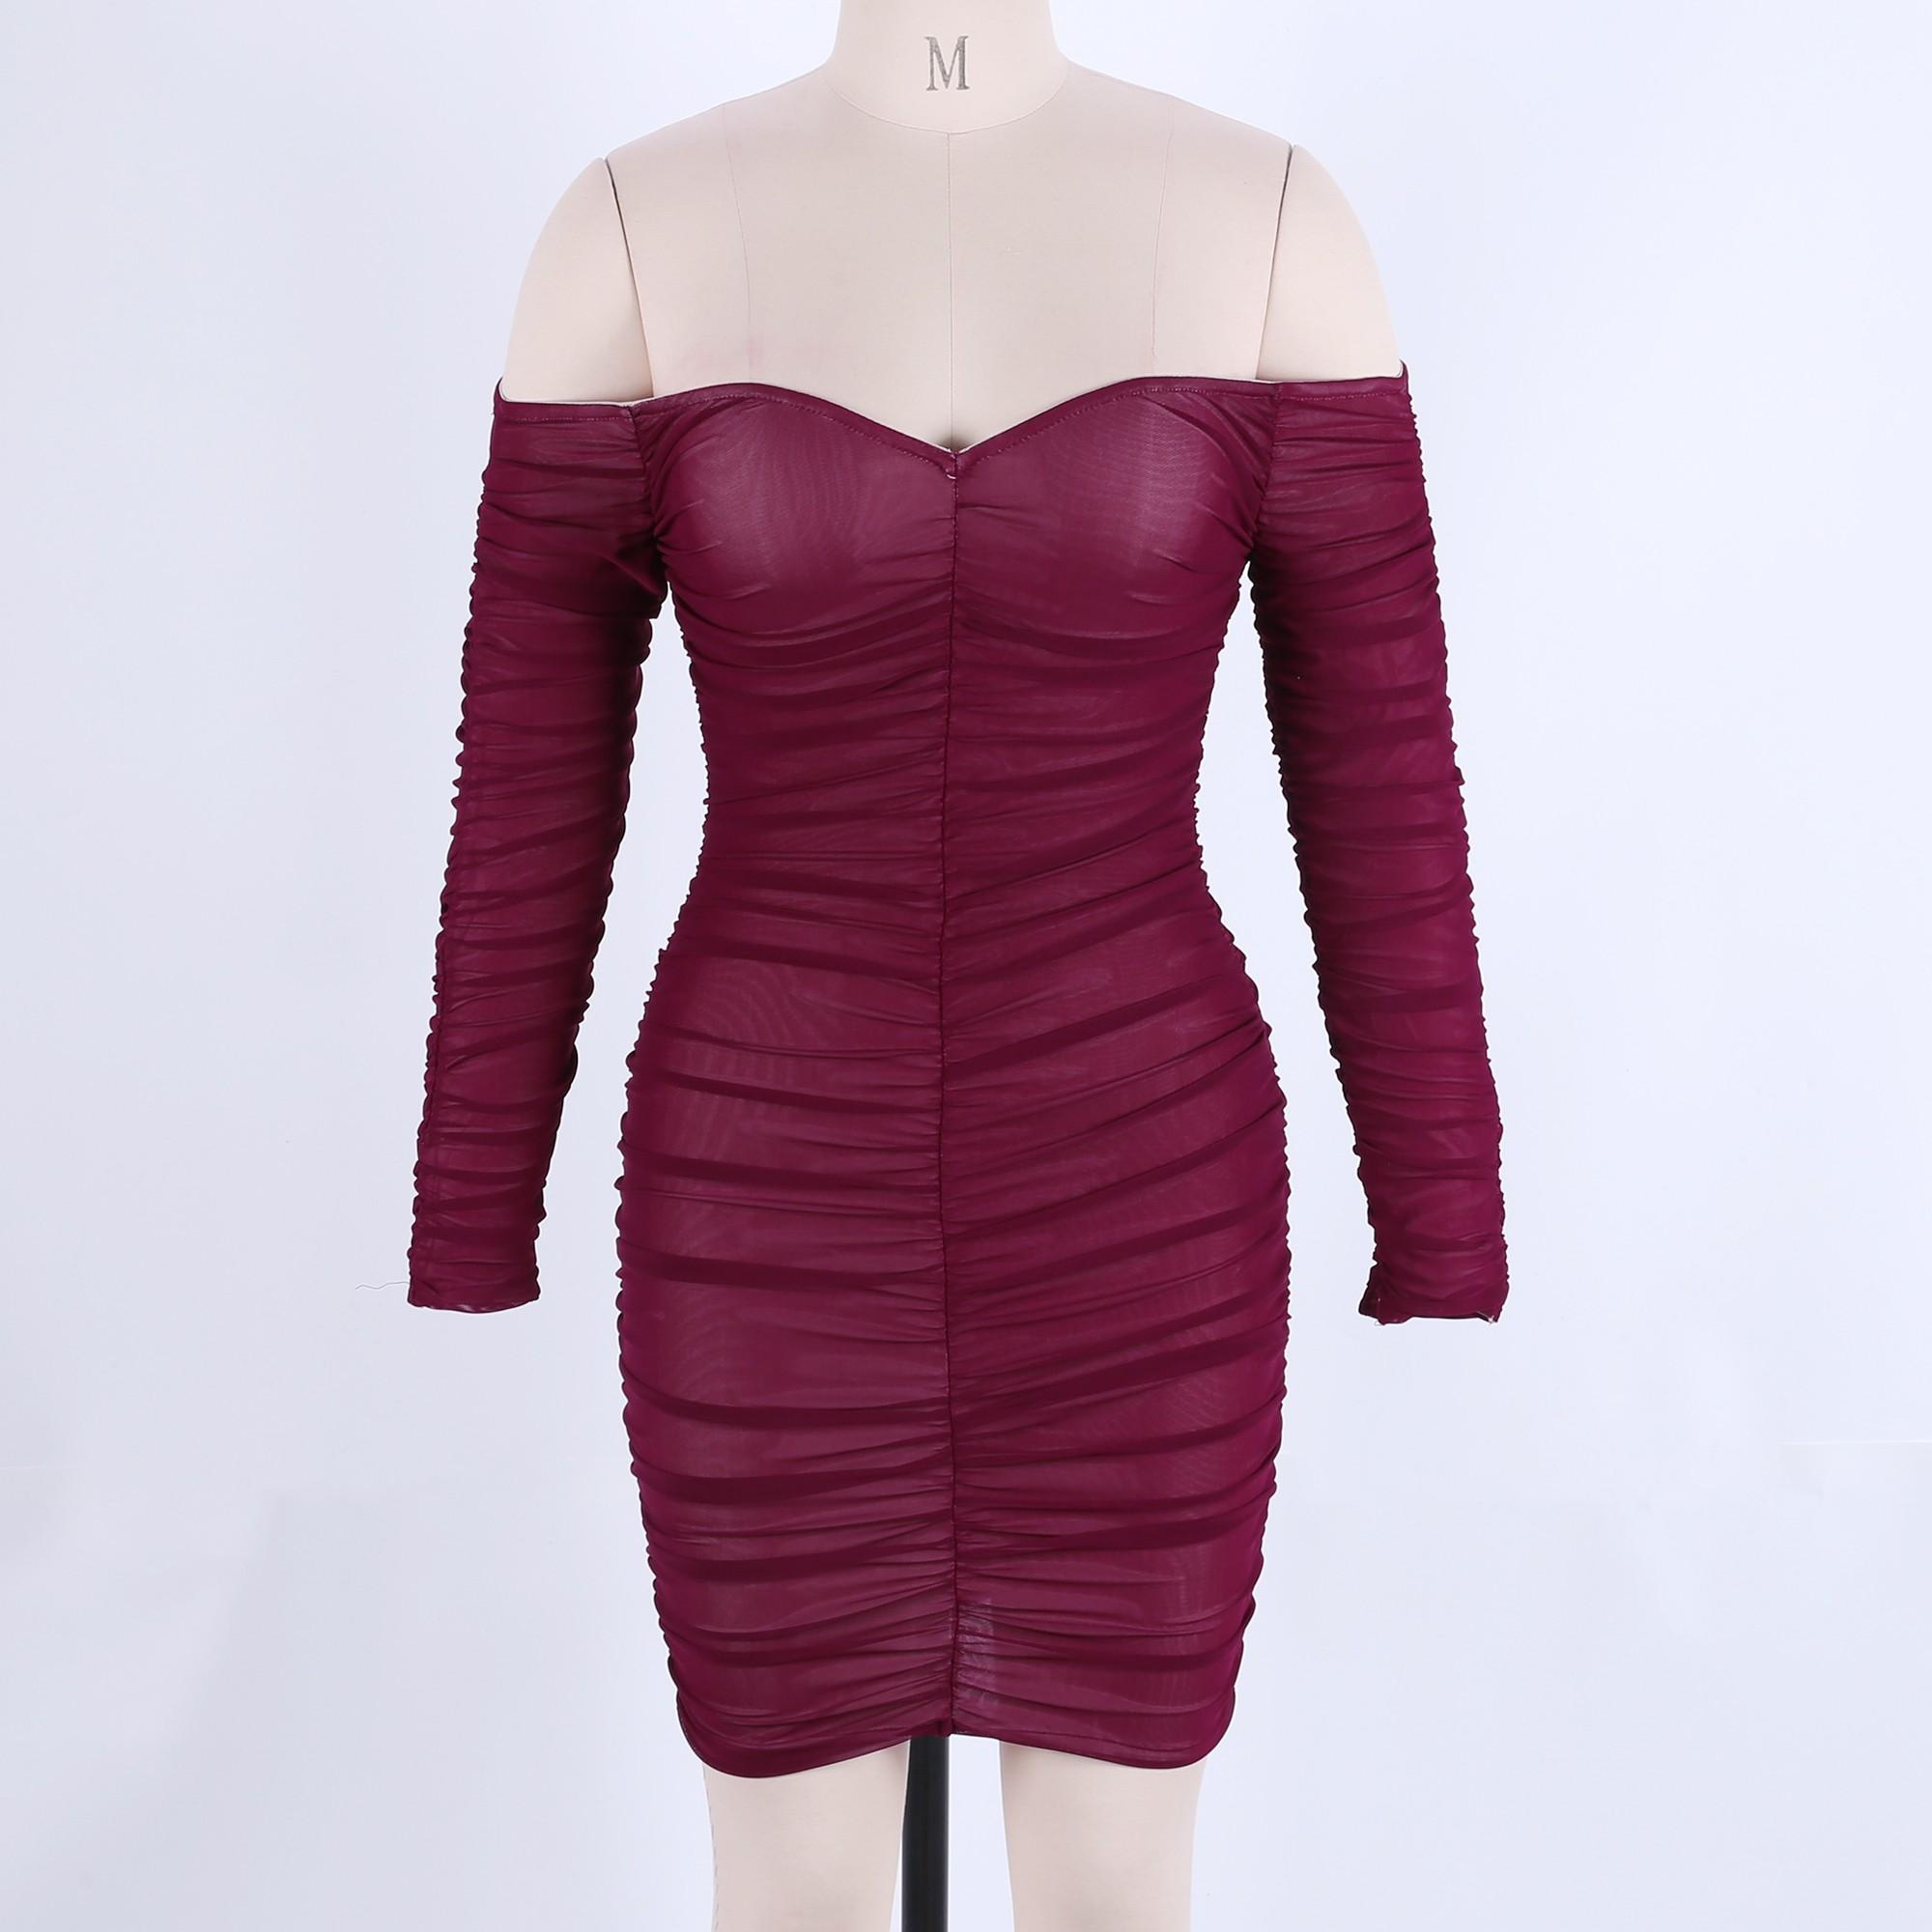 Wine Off Shoulder Longsleeve Mini Wrinkled Mesh Evening Bodycon Dress HF118-Wine